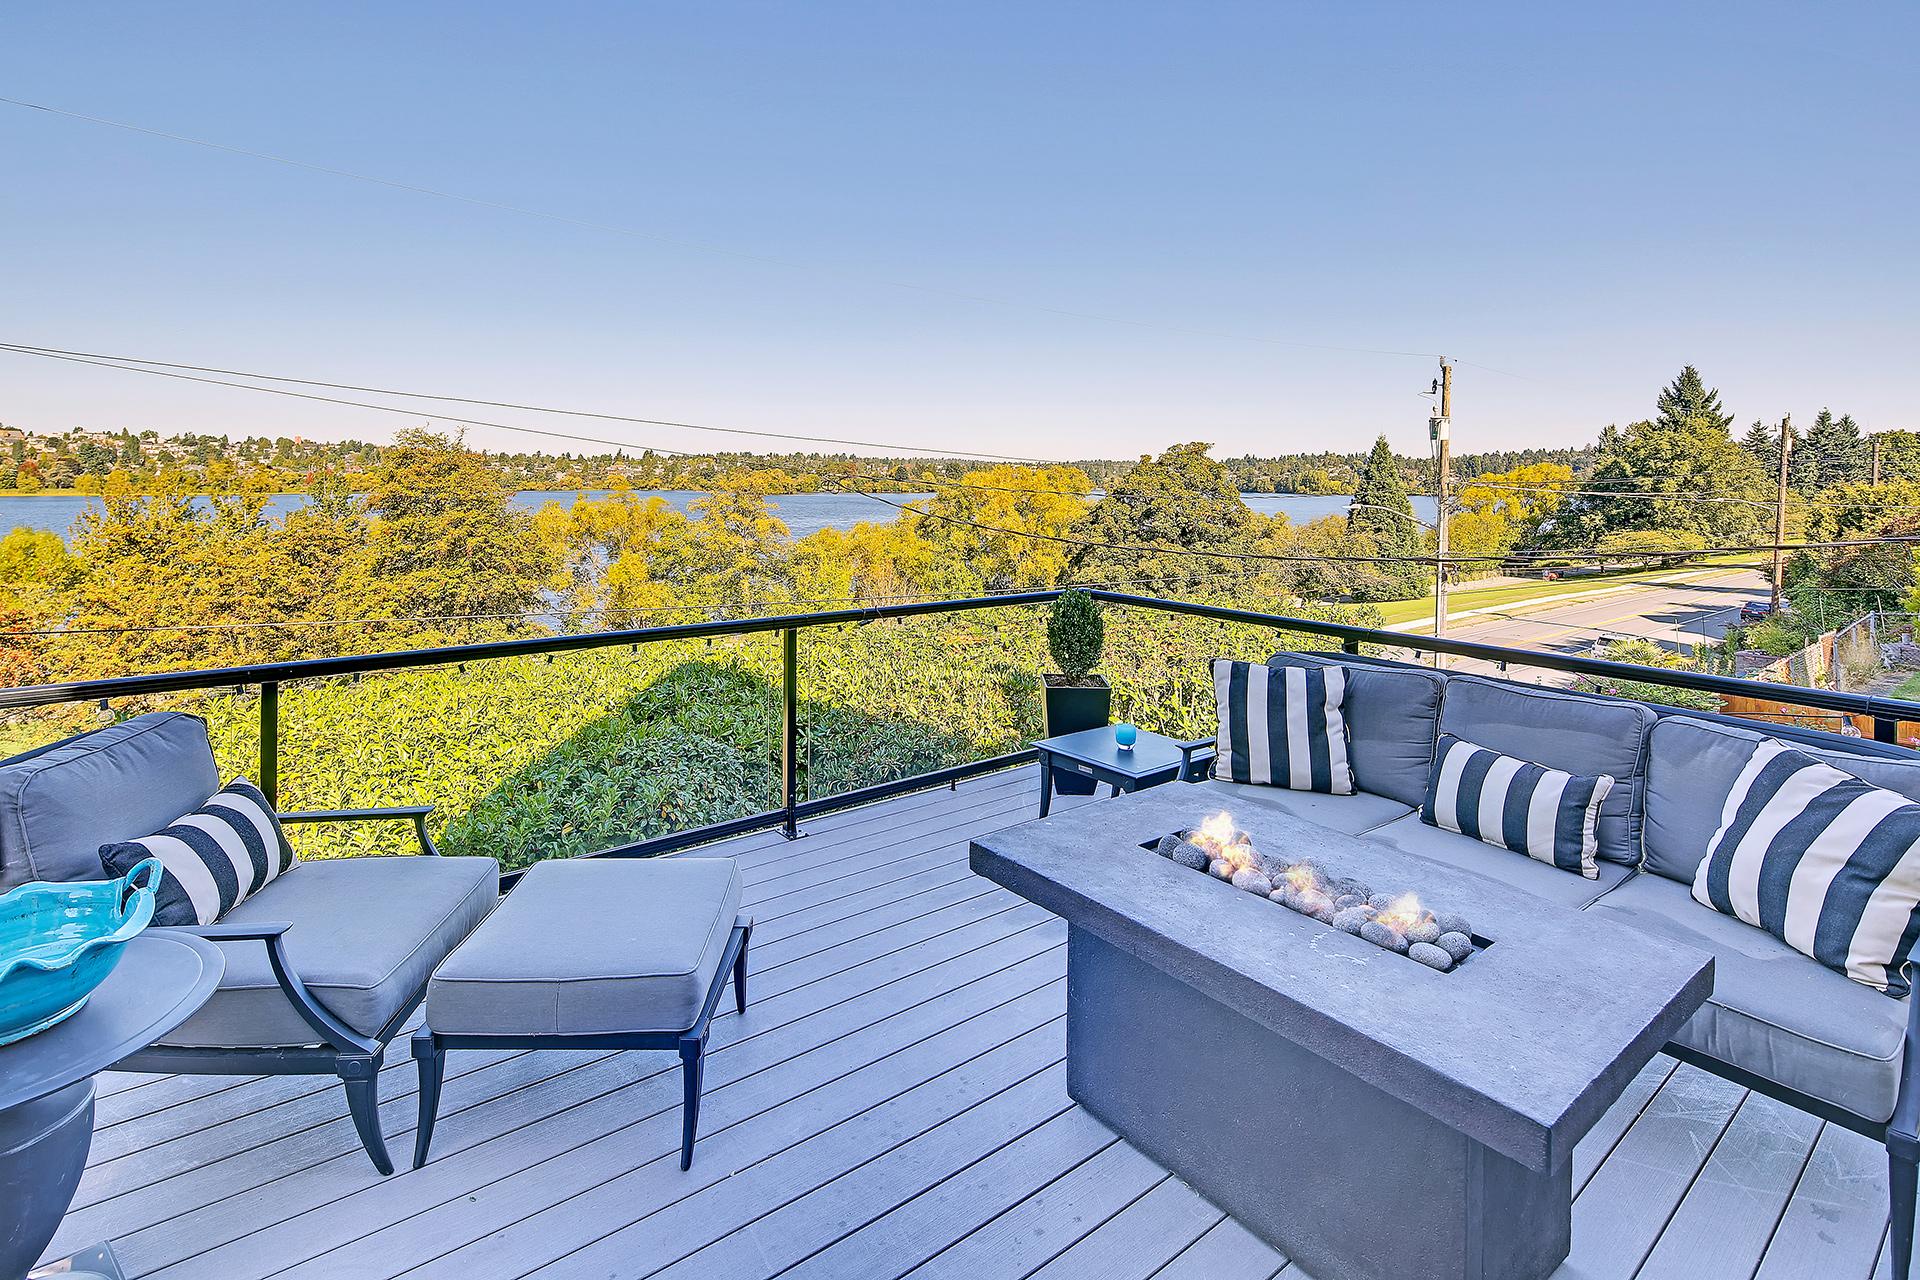 Deck-Carissa-Saffel-Real-Estate.jpg